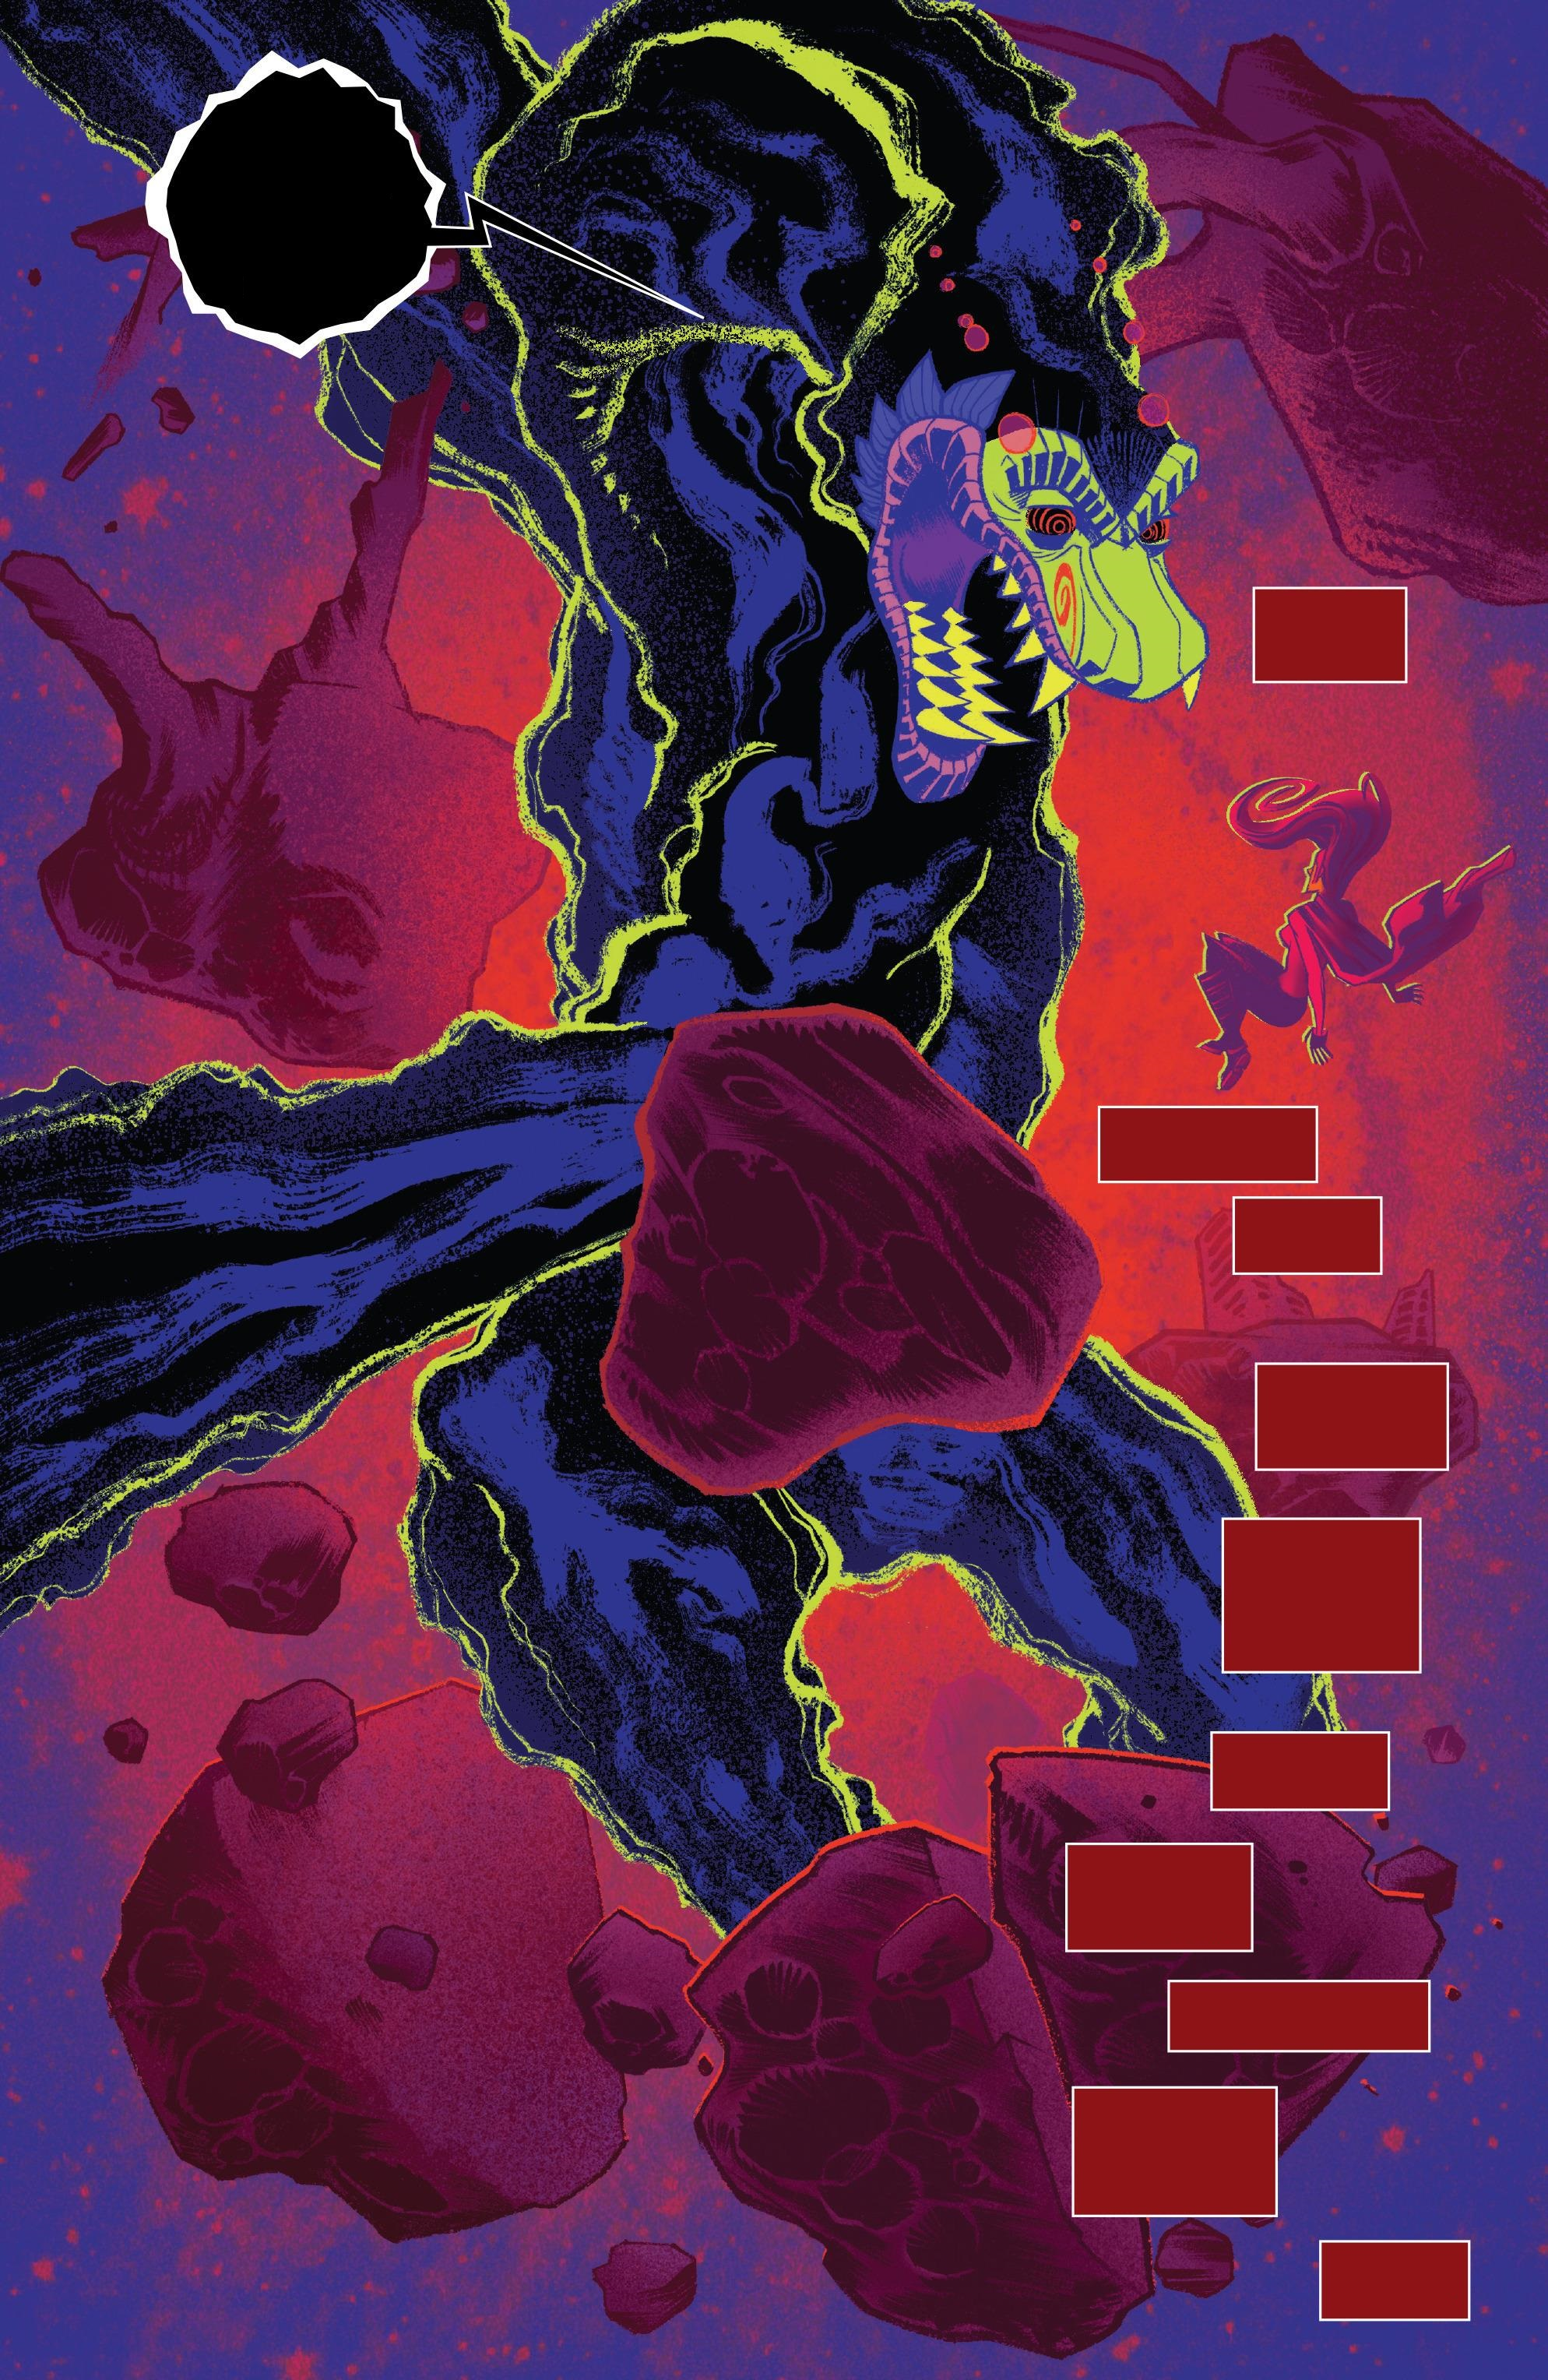 Chaos (Entity) (Earth-616)